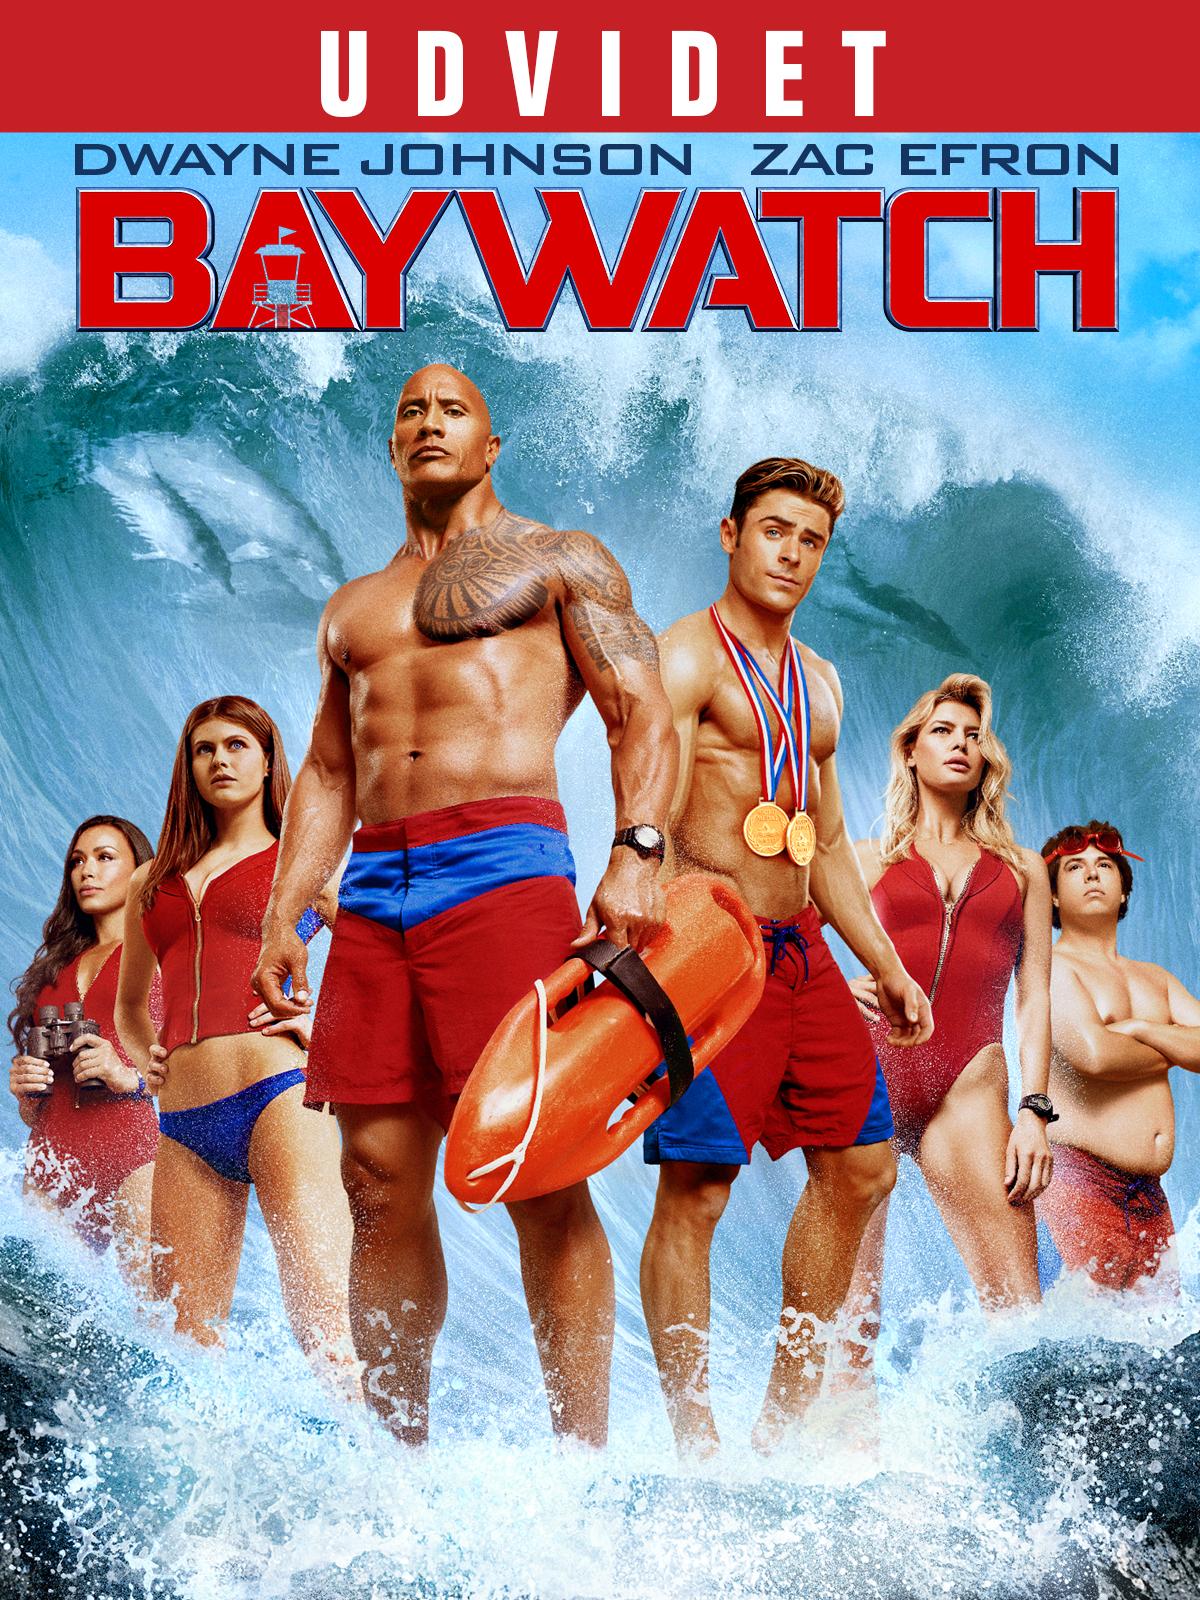 Baywatch - Udvidet